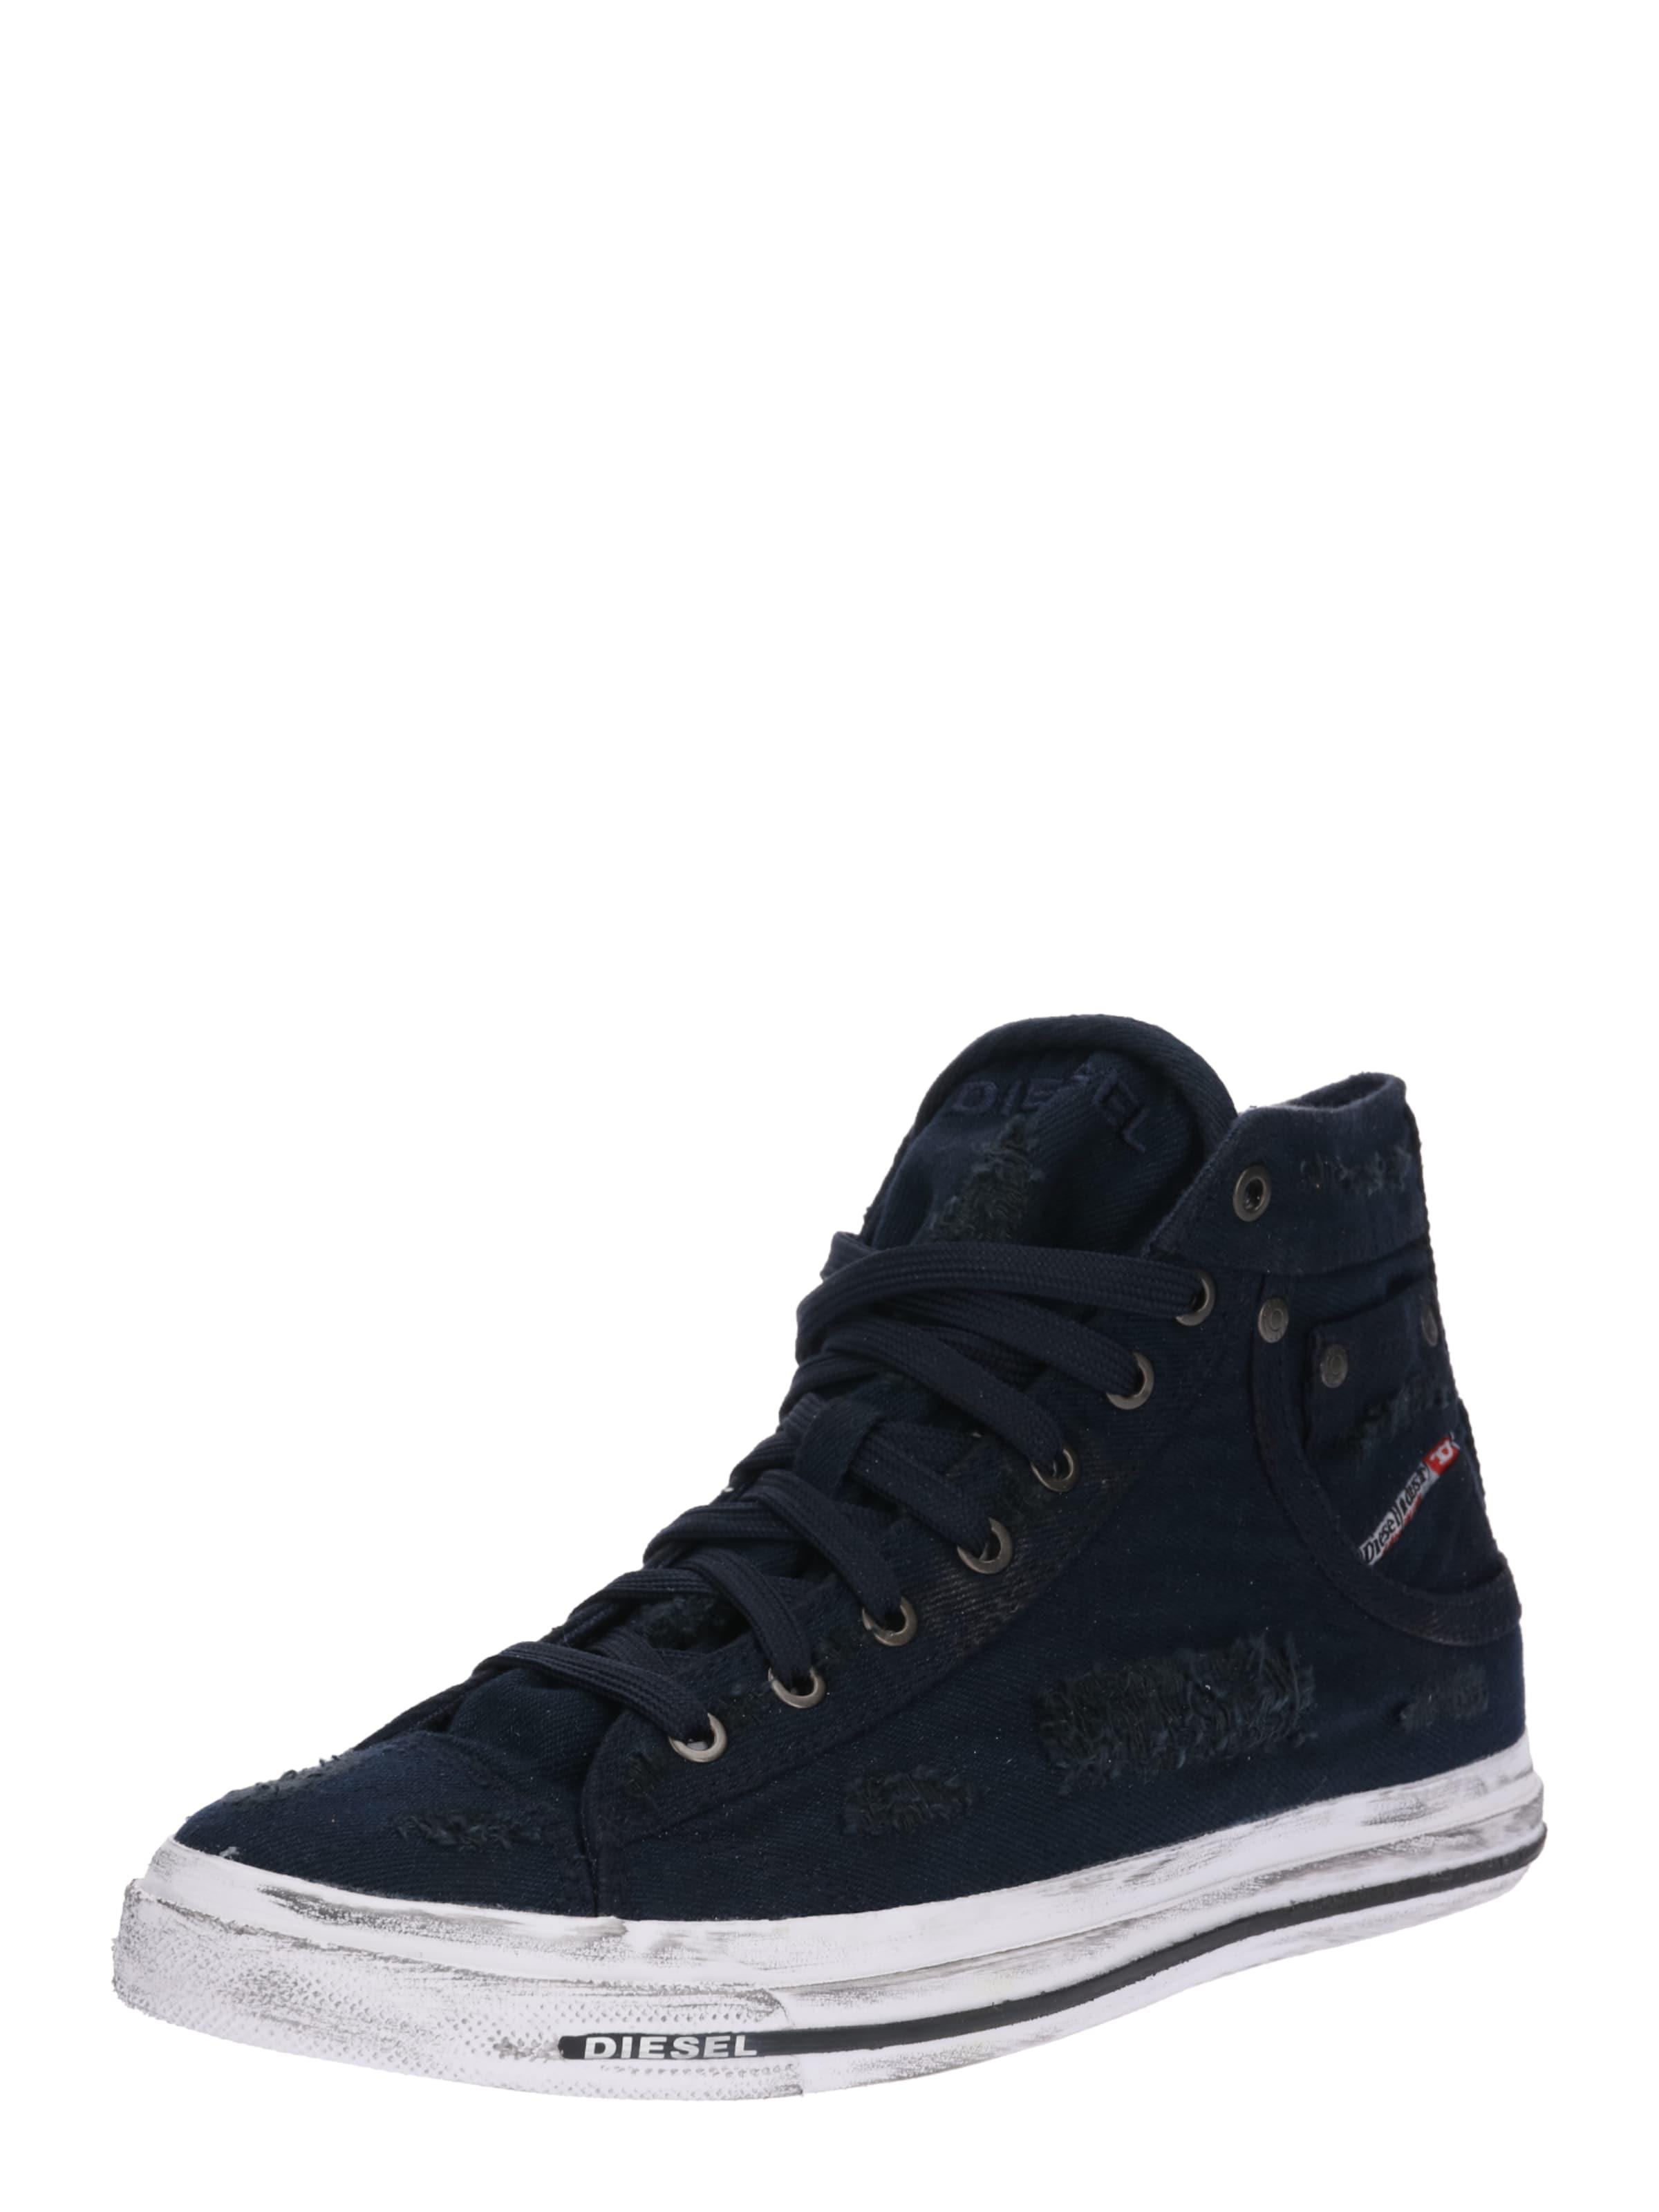 Haltbare Mode billige Schuhe DIESEL | Gut Sneaker 'EXPOSURE I' Schuhe Gut | getragene Schuhe f30837